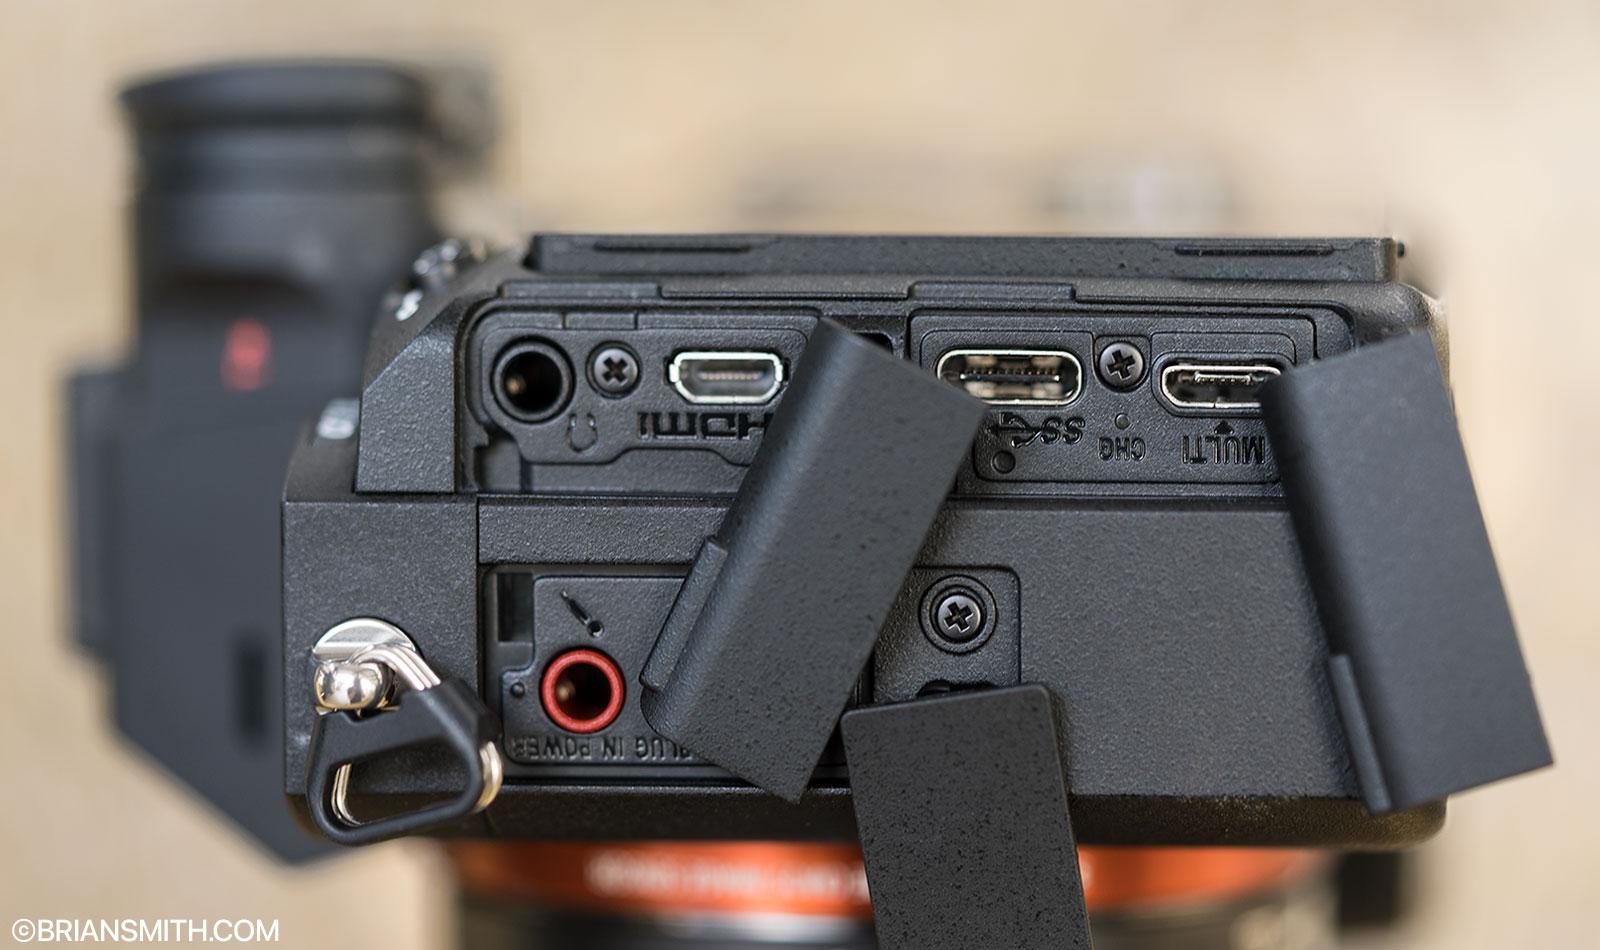 Sony a7 III ports